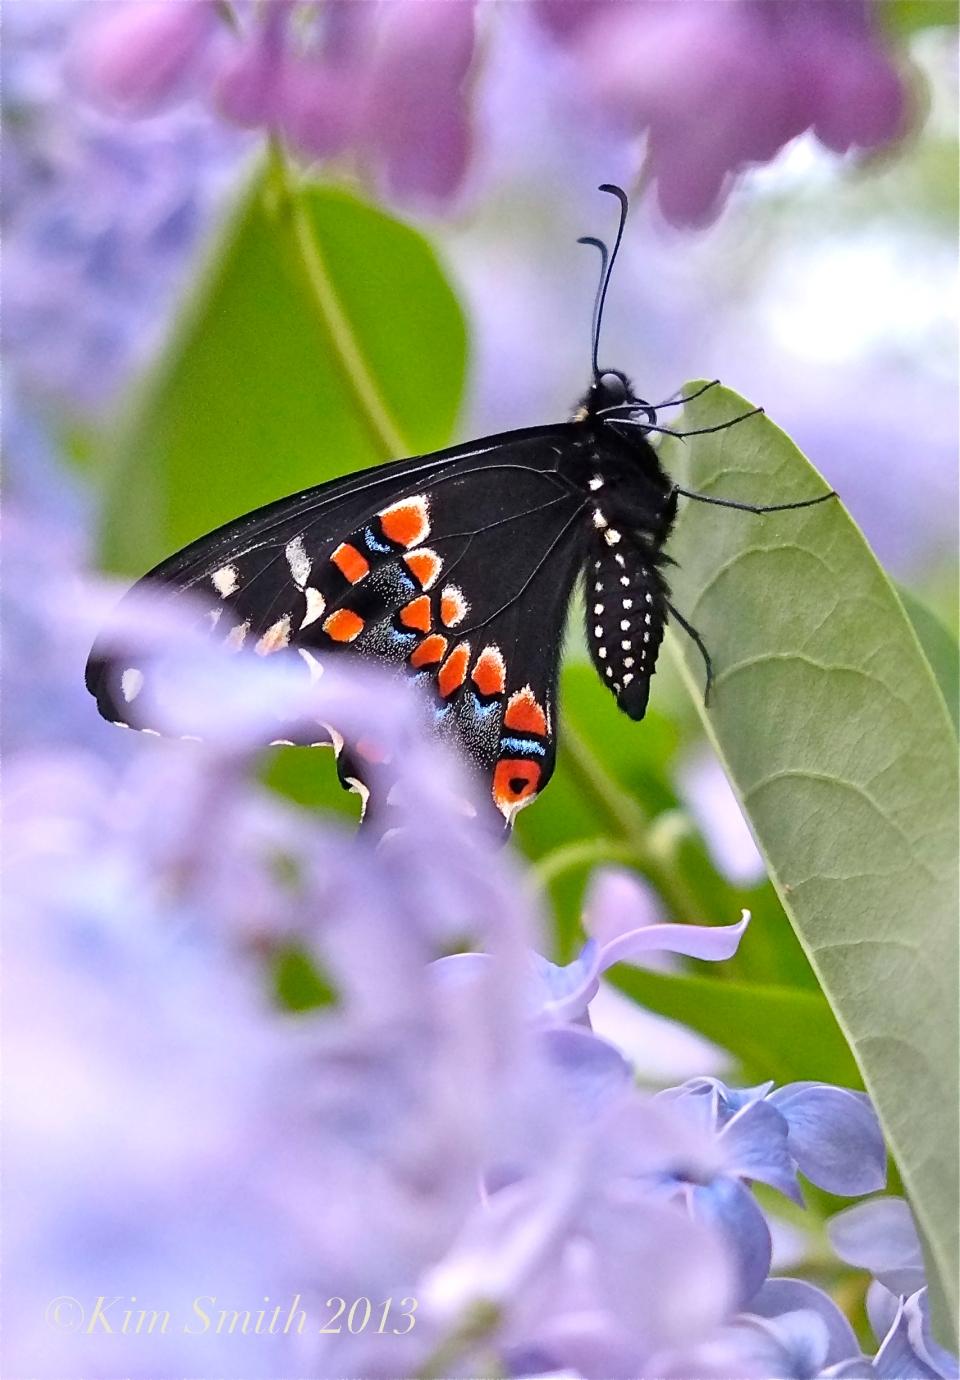 Male Black Swallowtail Butterfly Wedgewood Blue Lilac ©Kim Smith 2013